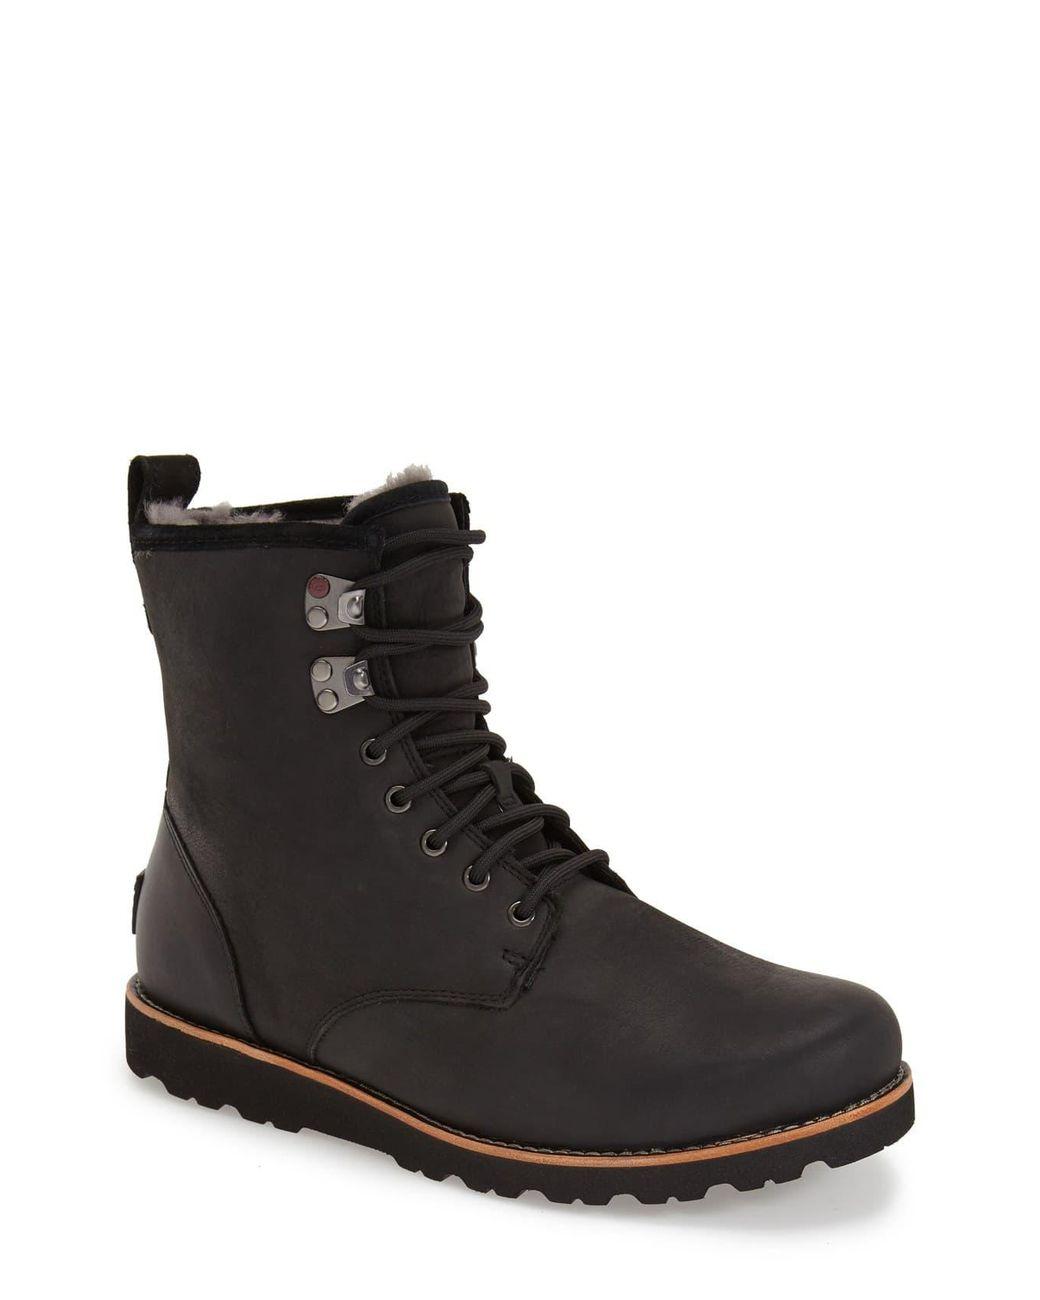 dc4d6cbe88c Men's Black Ugg Hannen Plain Toe Waterproof Boot With Genuine Shearling